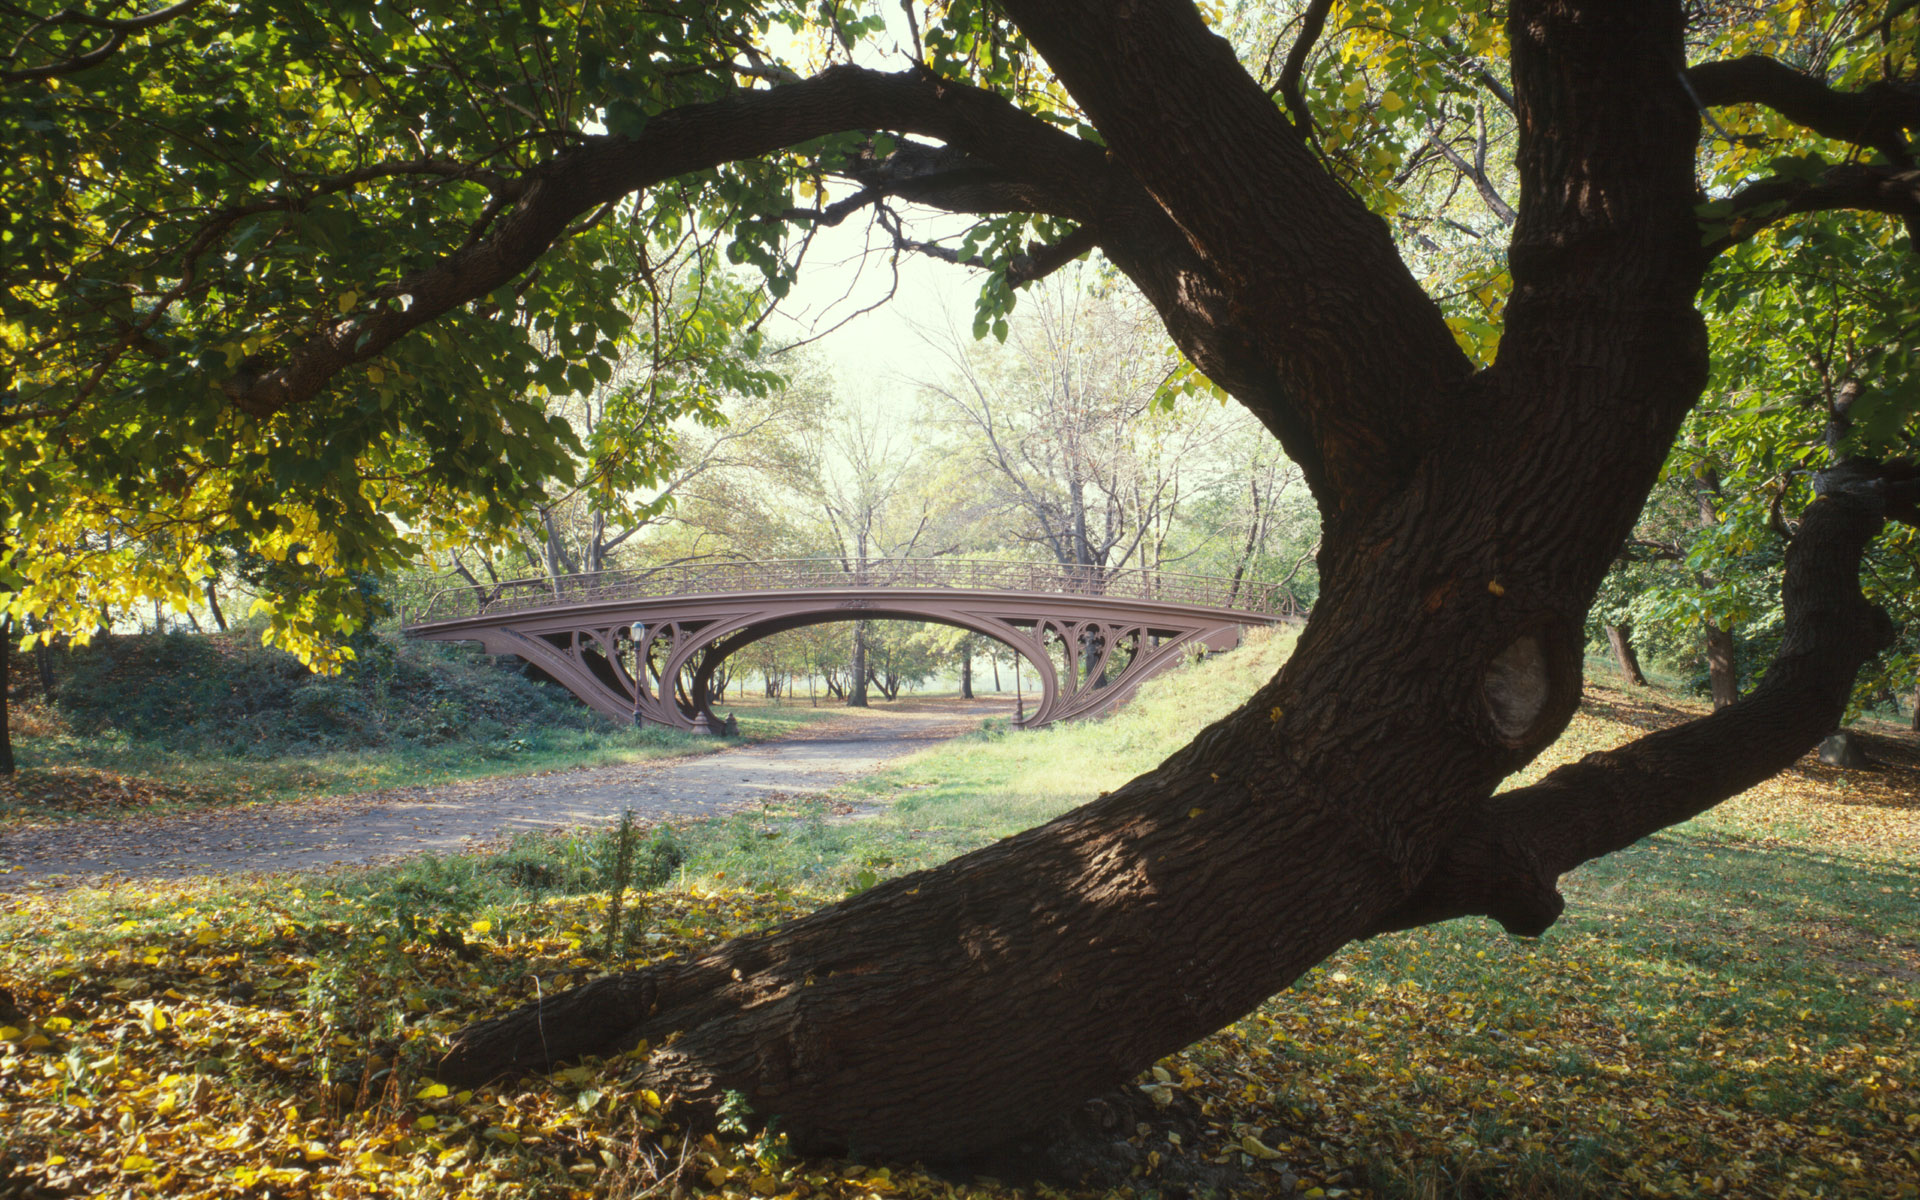 http://environmentalgeography.files.wordpress.com/2009/09/central-park-new-york-city.jpg